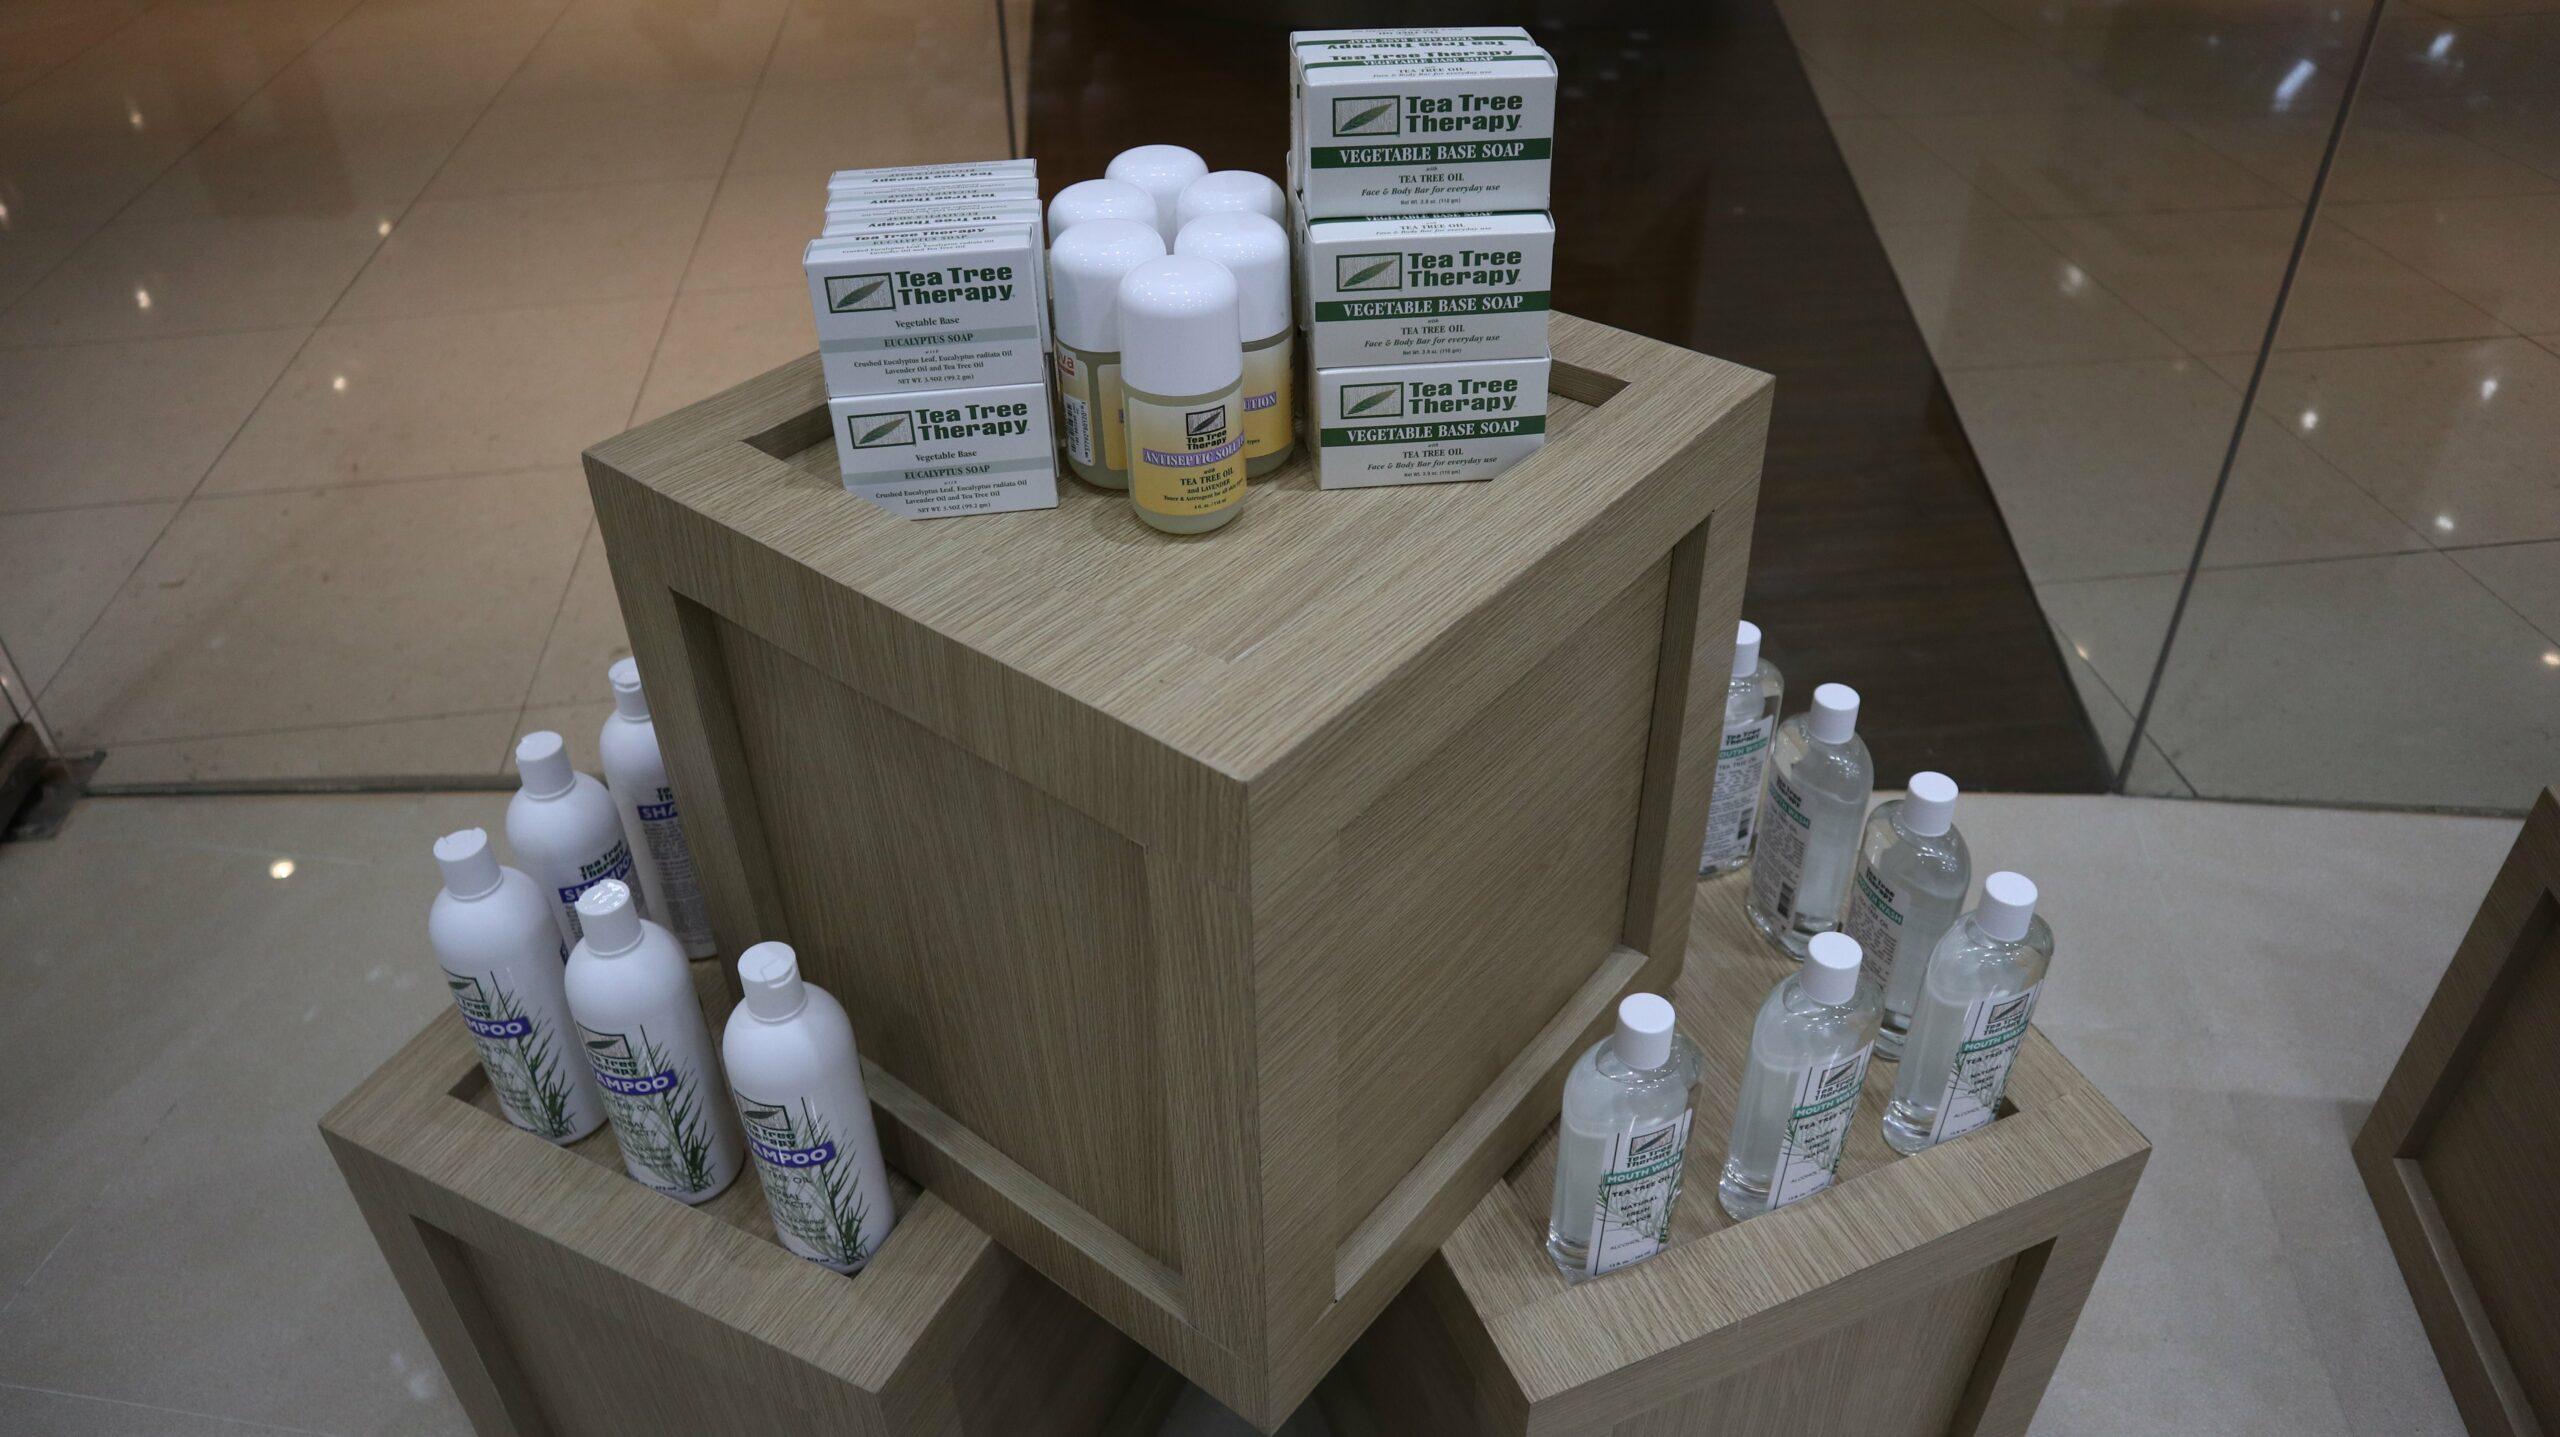 Nova Wellness Tea Tree Therapy Vegetable Base Soap and Antiseptic Solution Tea Tree Oil